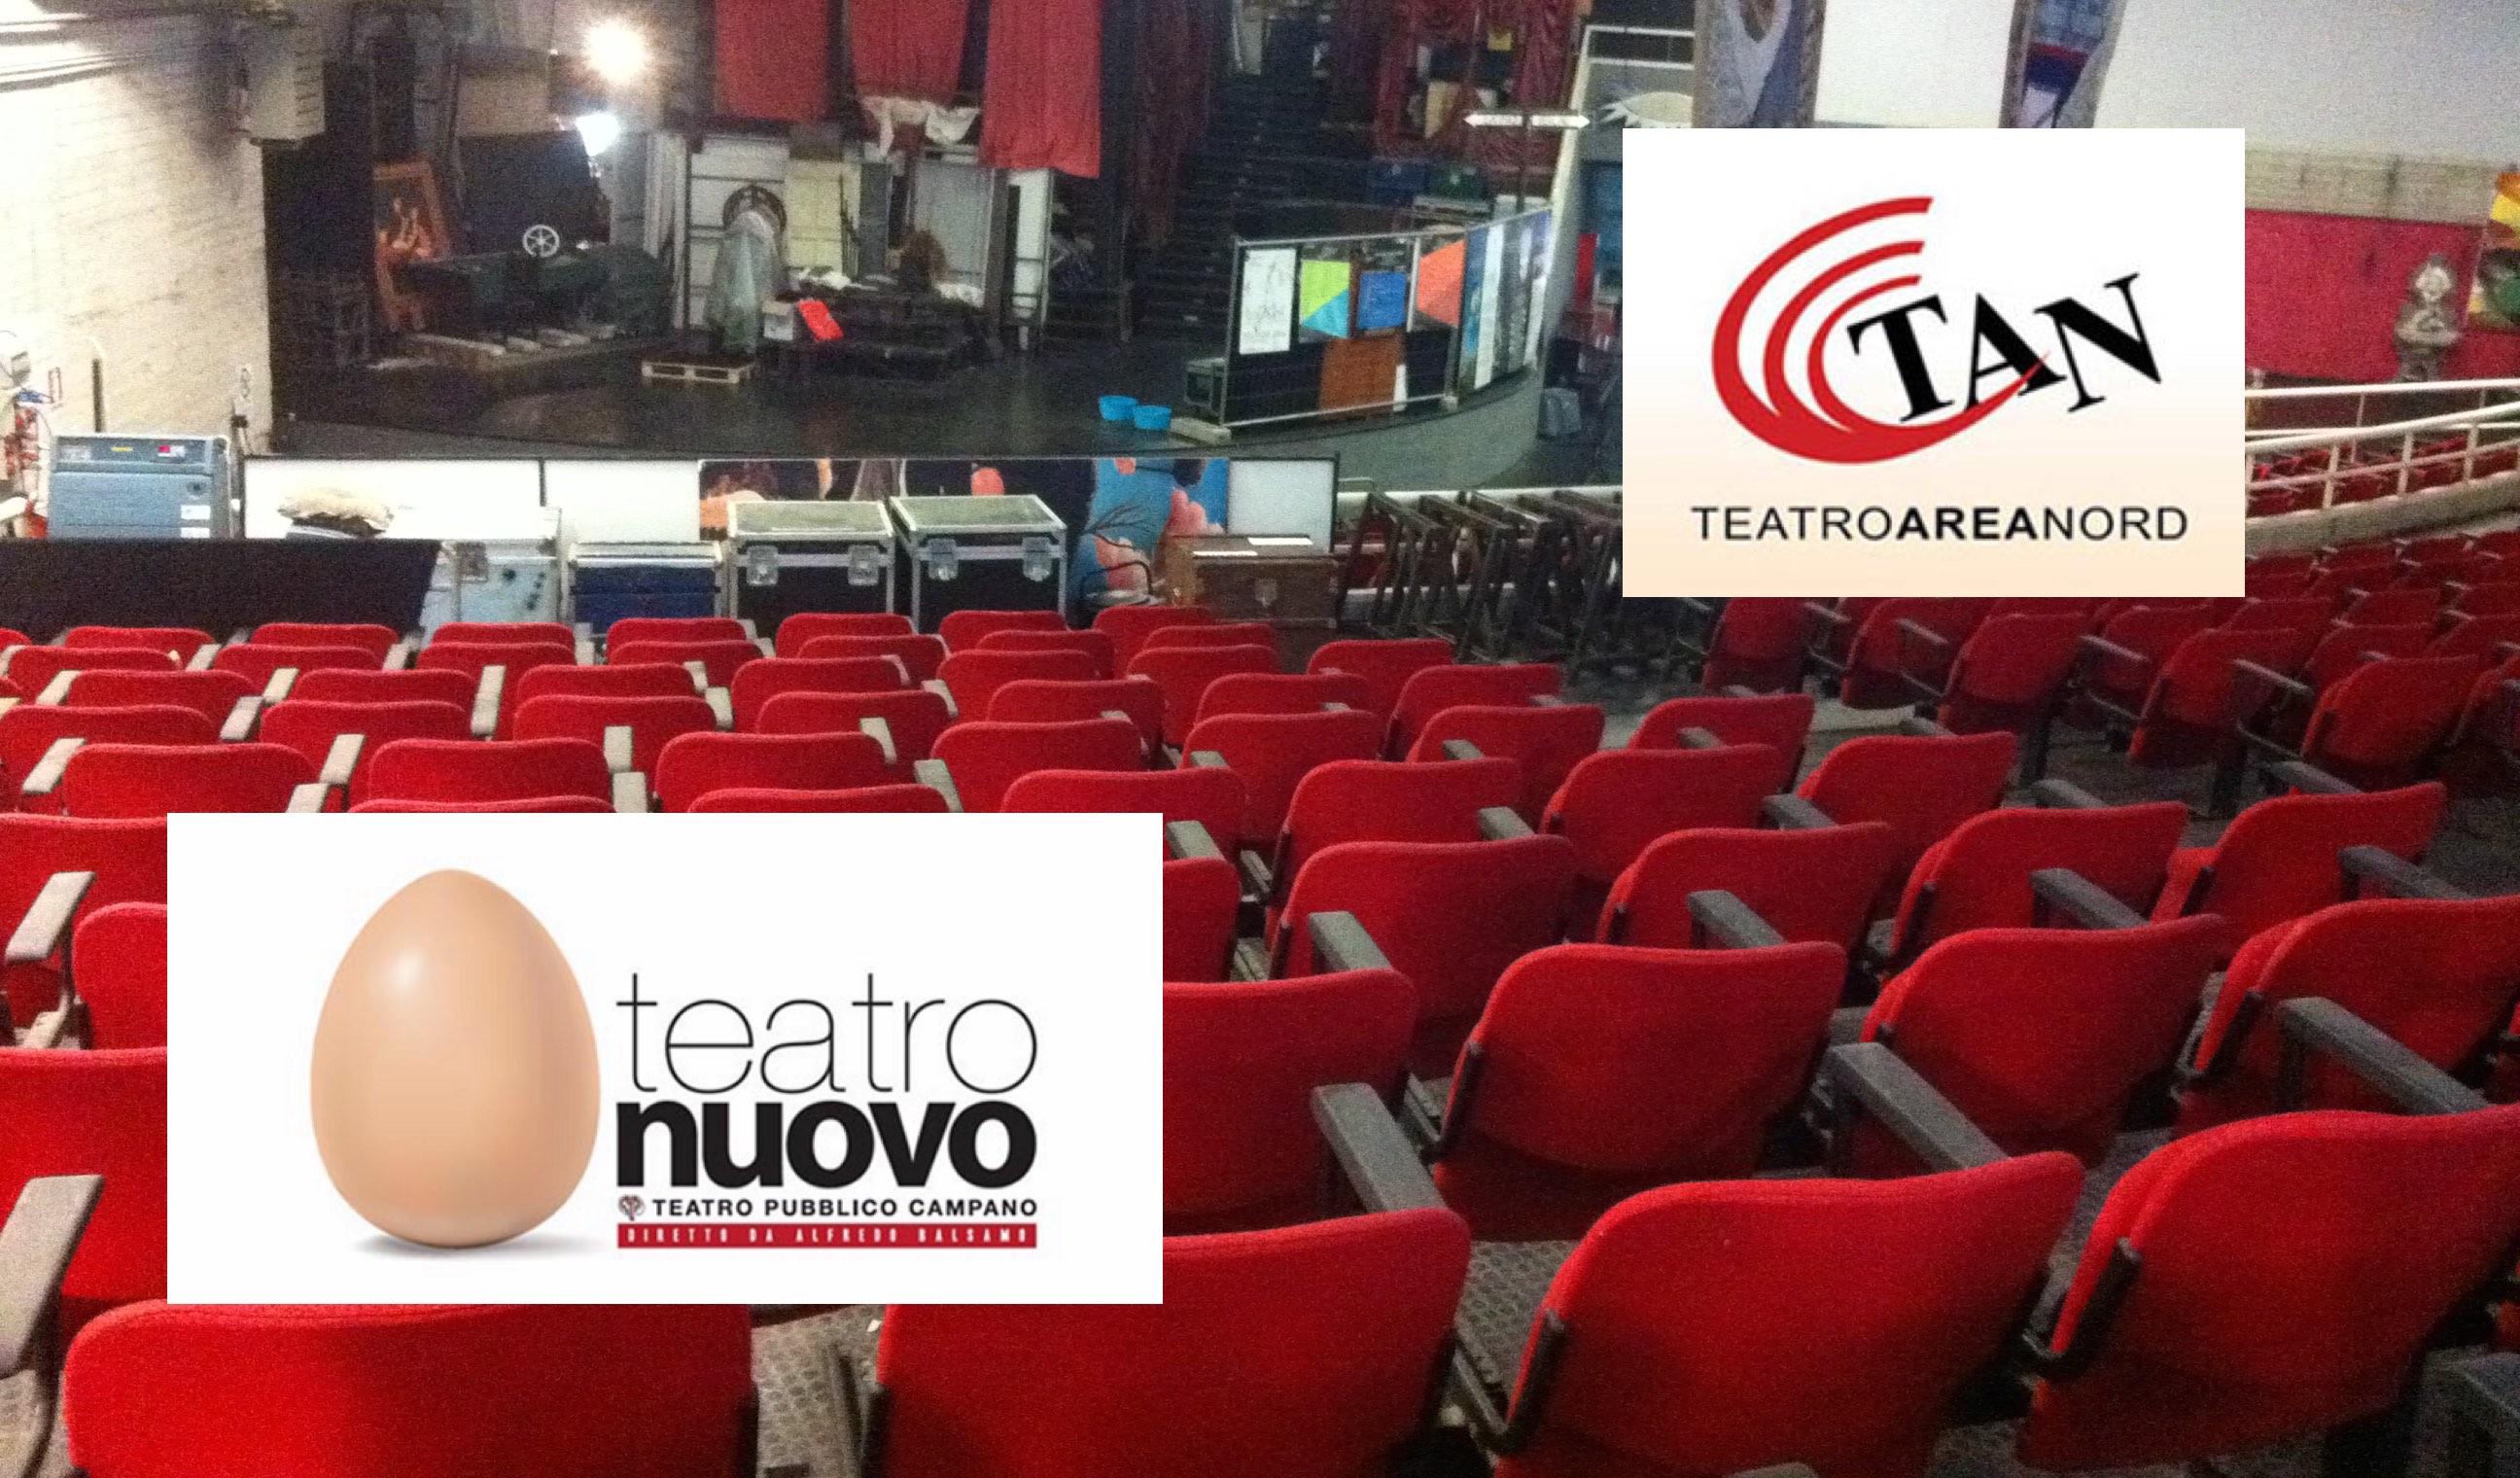 2015.09.24 - La stagione teatrale napoletana 2015-2016  IV puntata